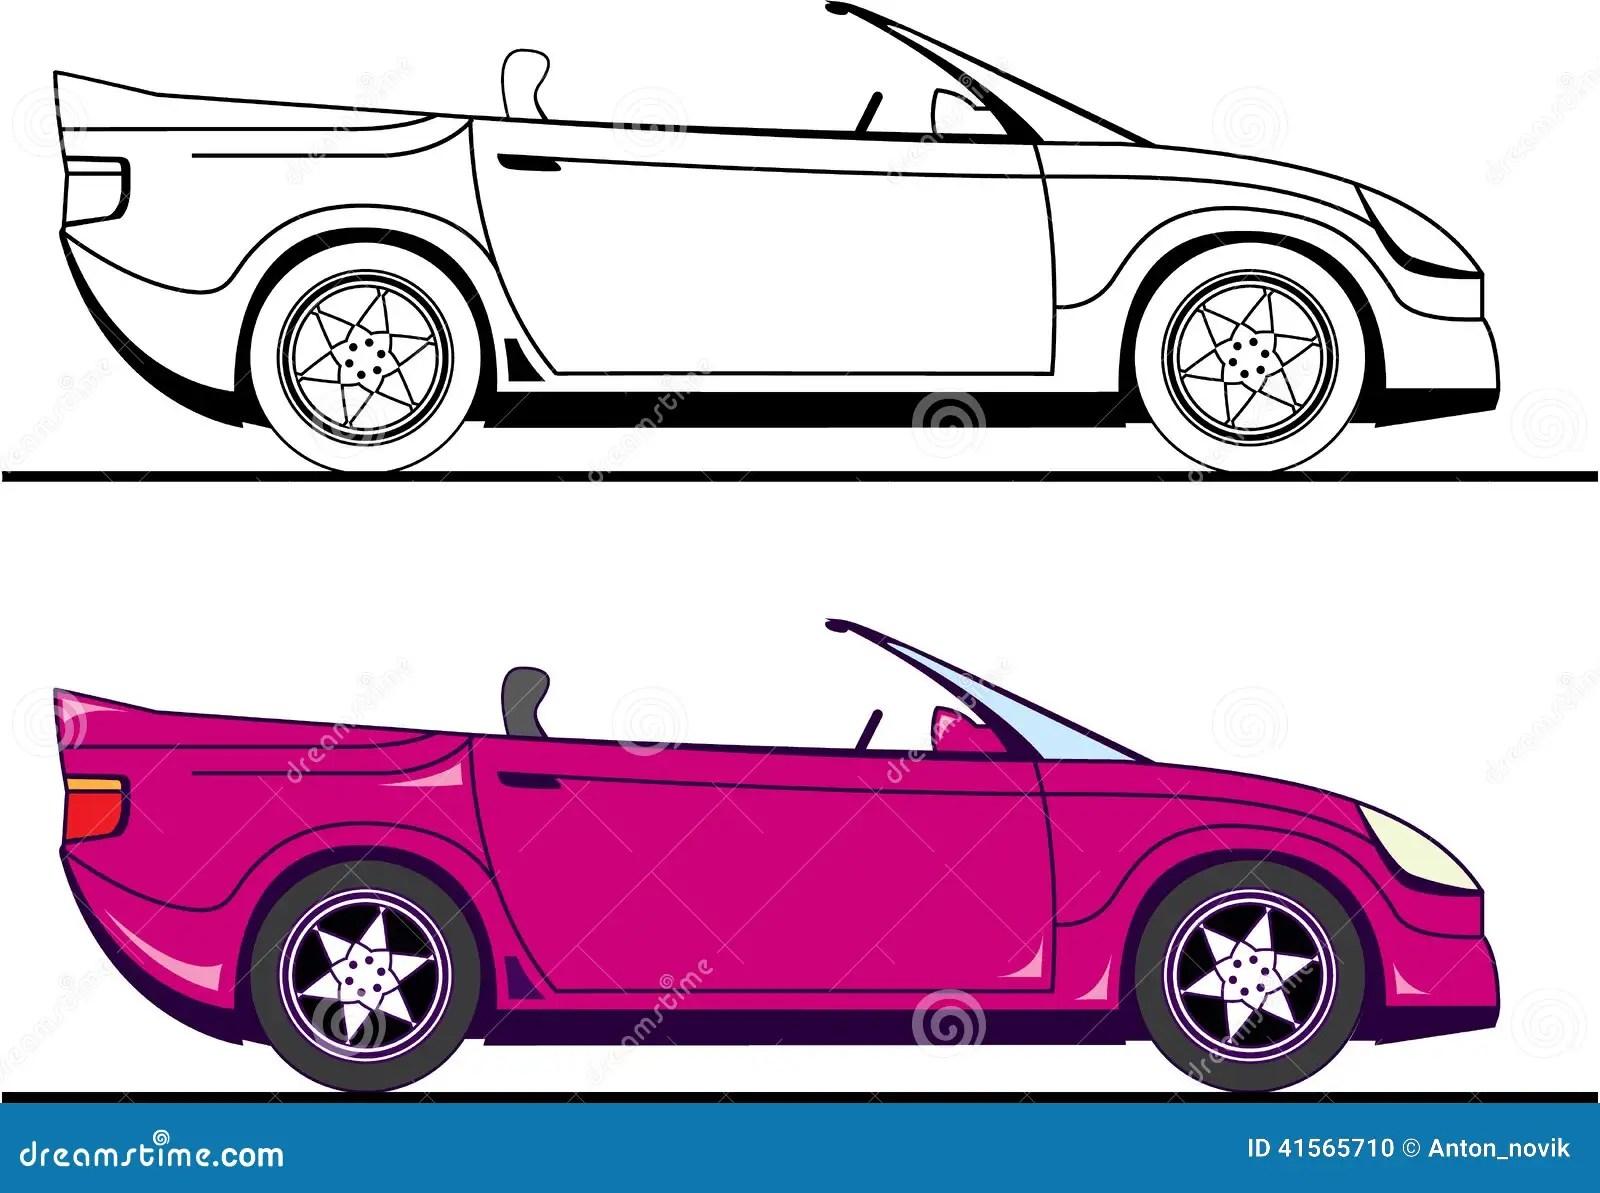 vehicle diagram clip art john deere lt133 wiring convertible stock vector image 41565710